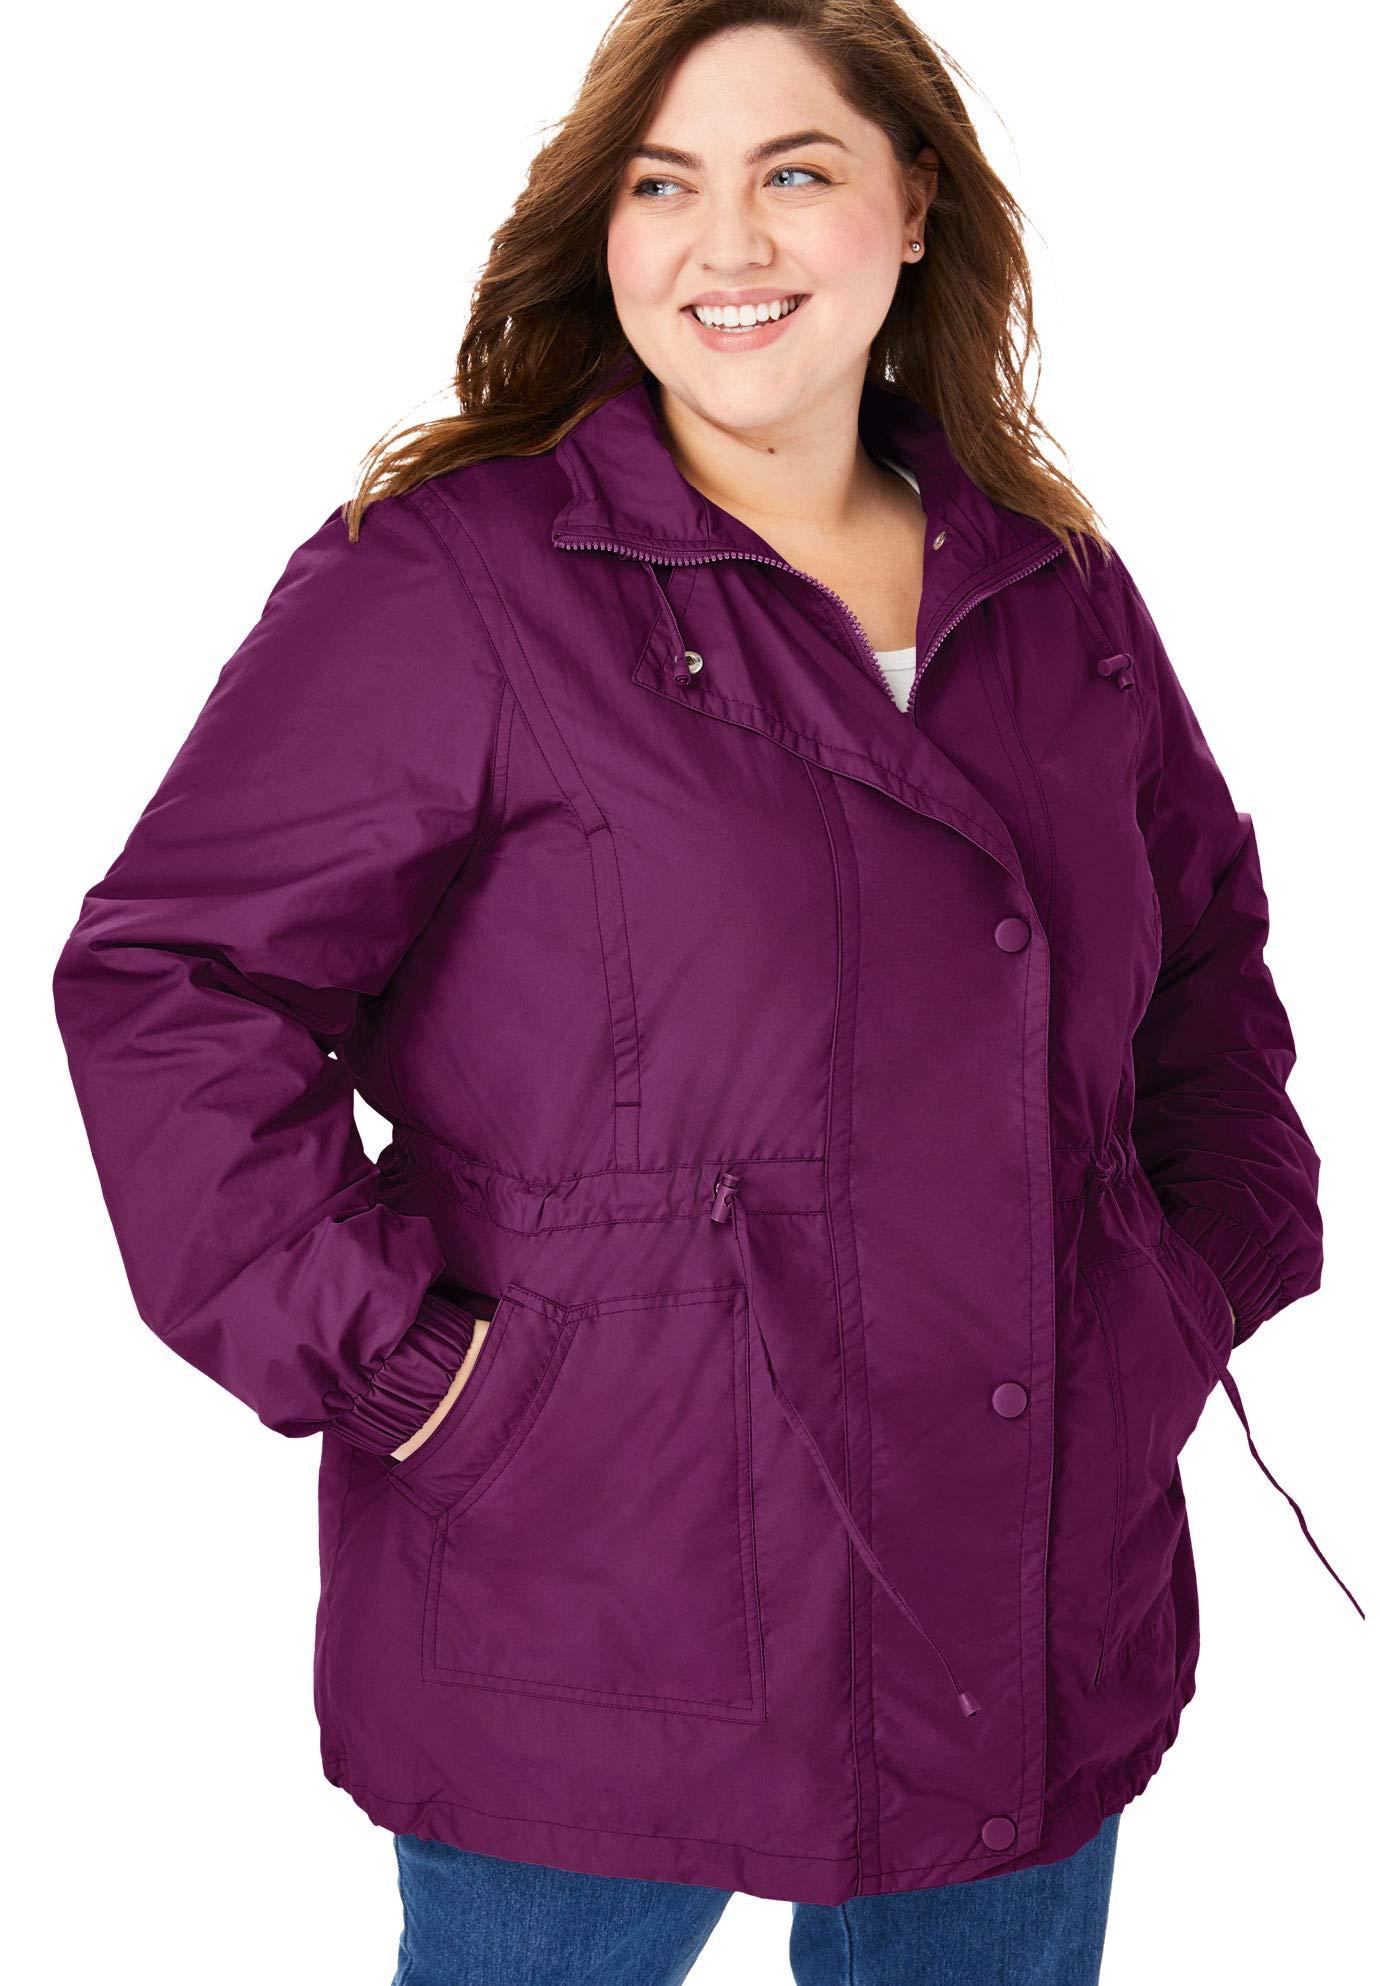 Woman Within Women's Plus Size Fleece-Lined Taslon Anorak - Dark Berry, 3X by Woman Within